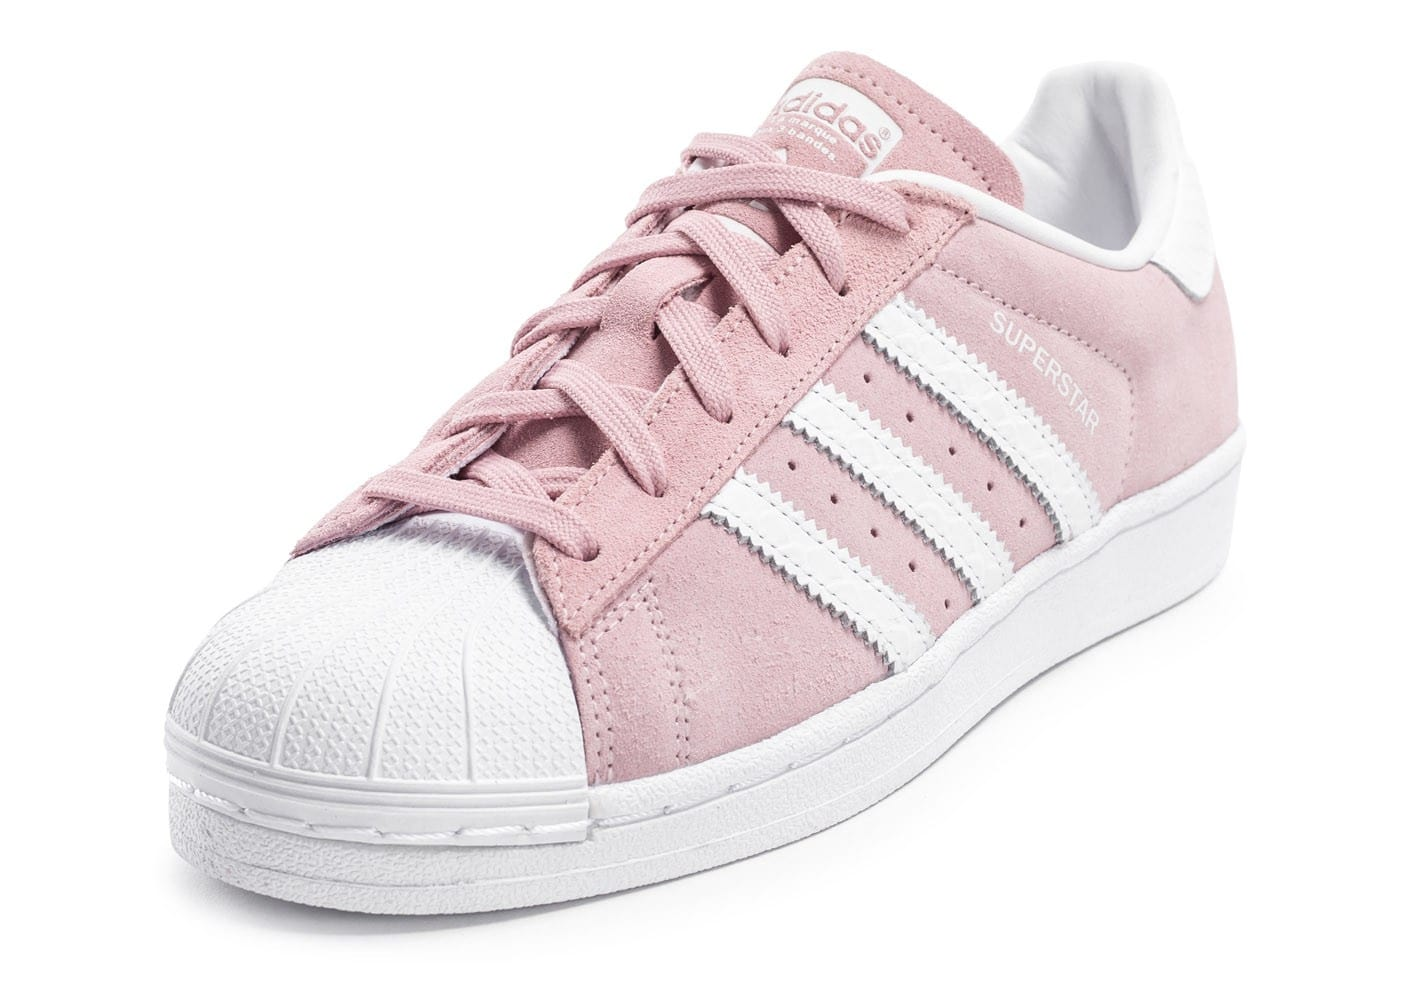 Adidas Chers Superstar Gatorade Daim Rose Bande Vente Pale Vert Pas 7Ybf6gy